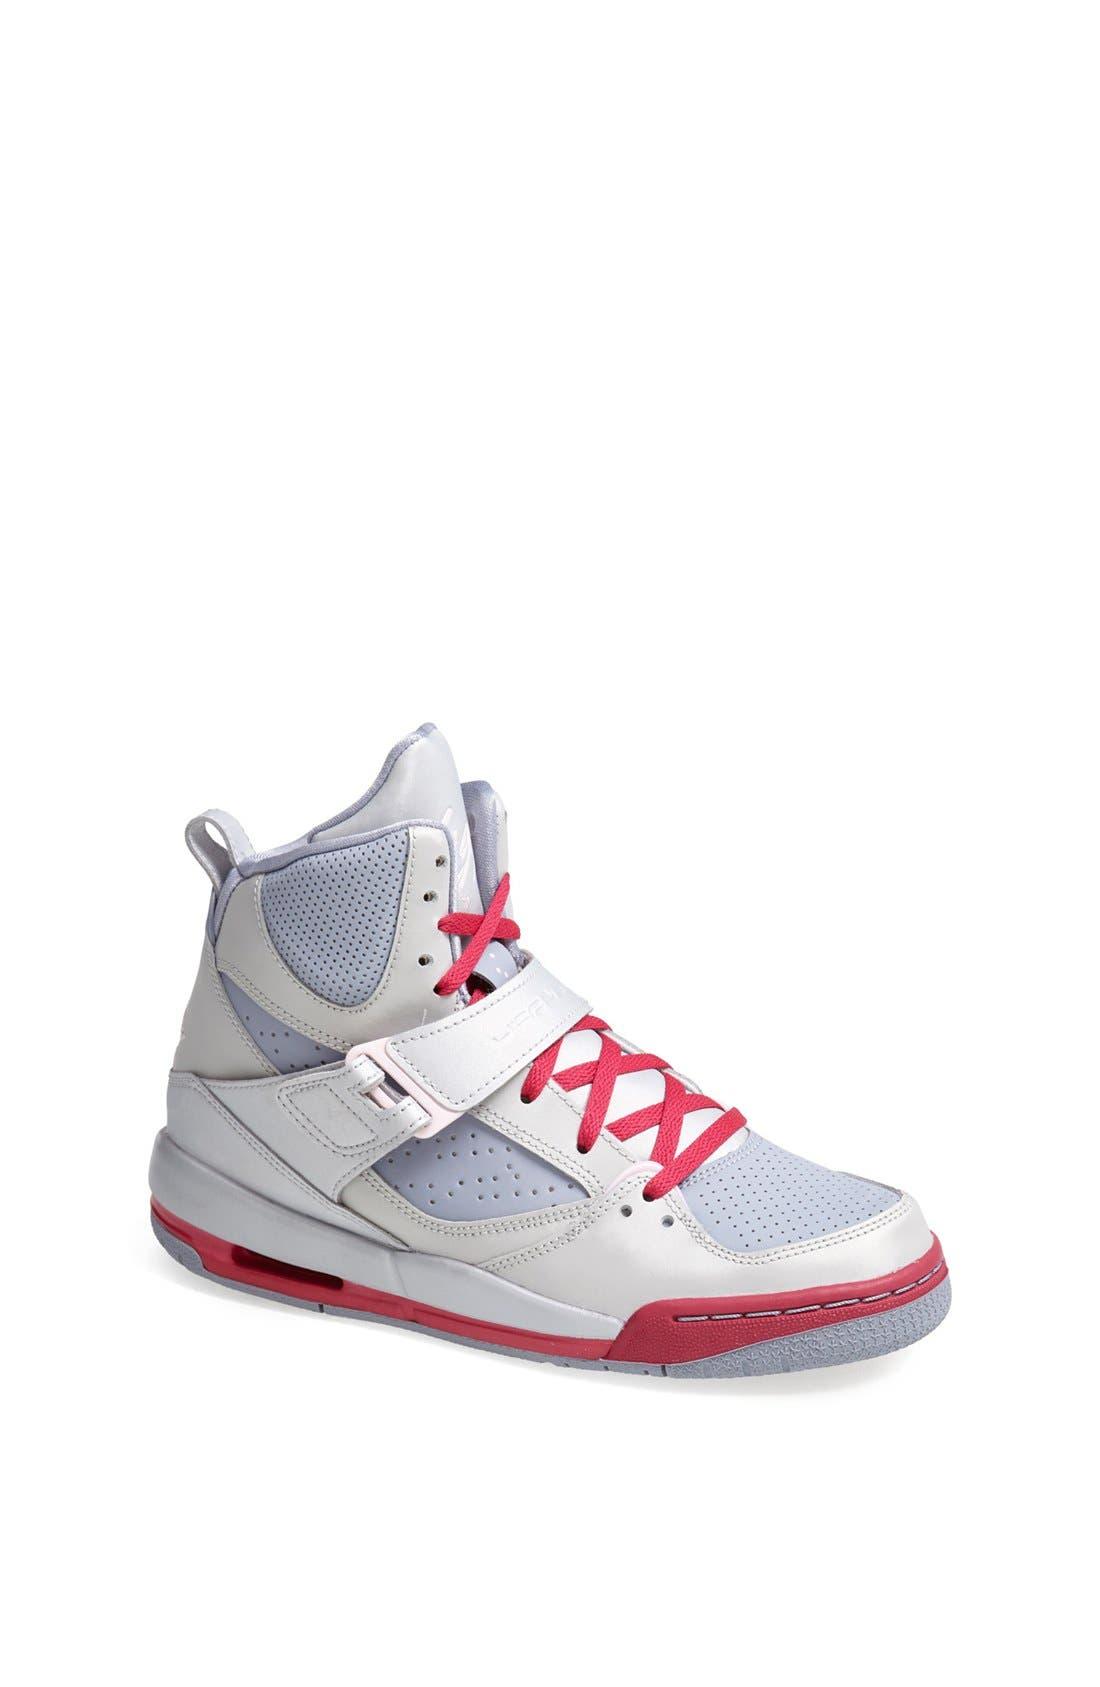 Alternate Image 1 Selected - Nike 'Jordan Flight 45' High Athletic Shoe (Big Kid)